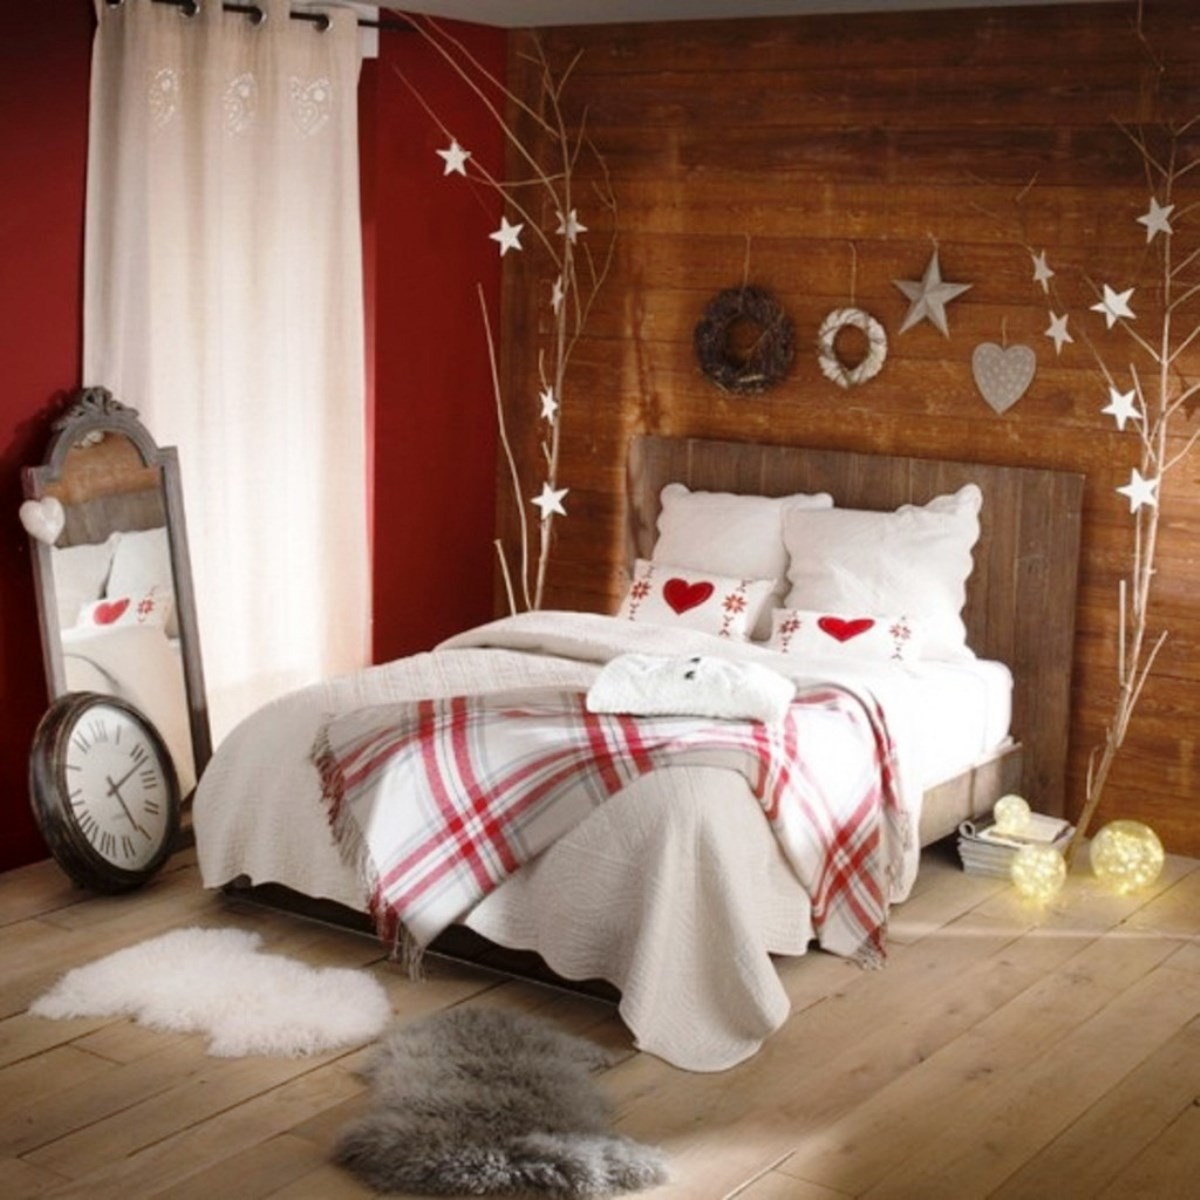 Holiday Apartment Decorating Ideas